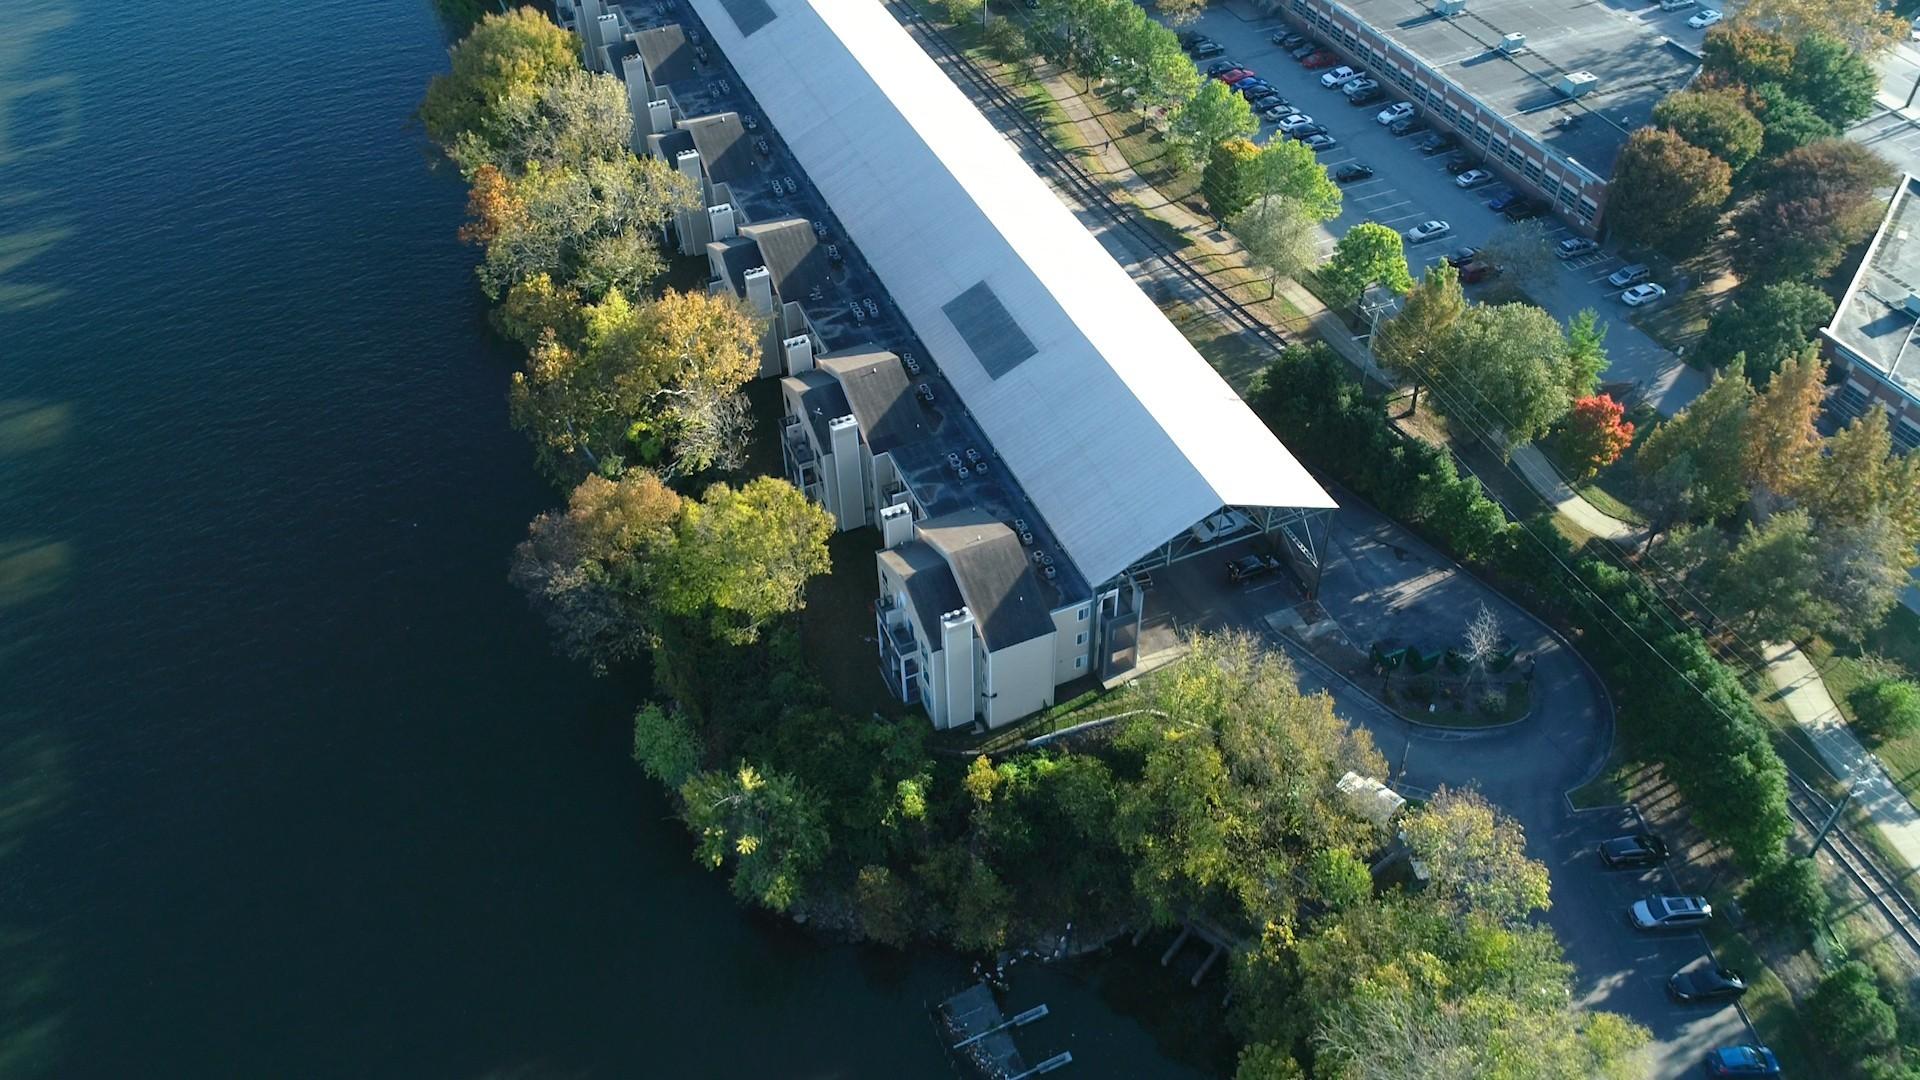 1004 1st Ave, N, Nashville, TN 37201 - Nashville, TN real estate listing